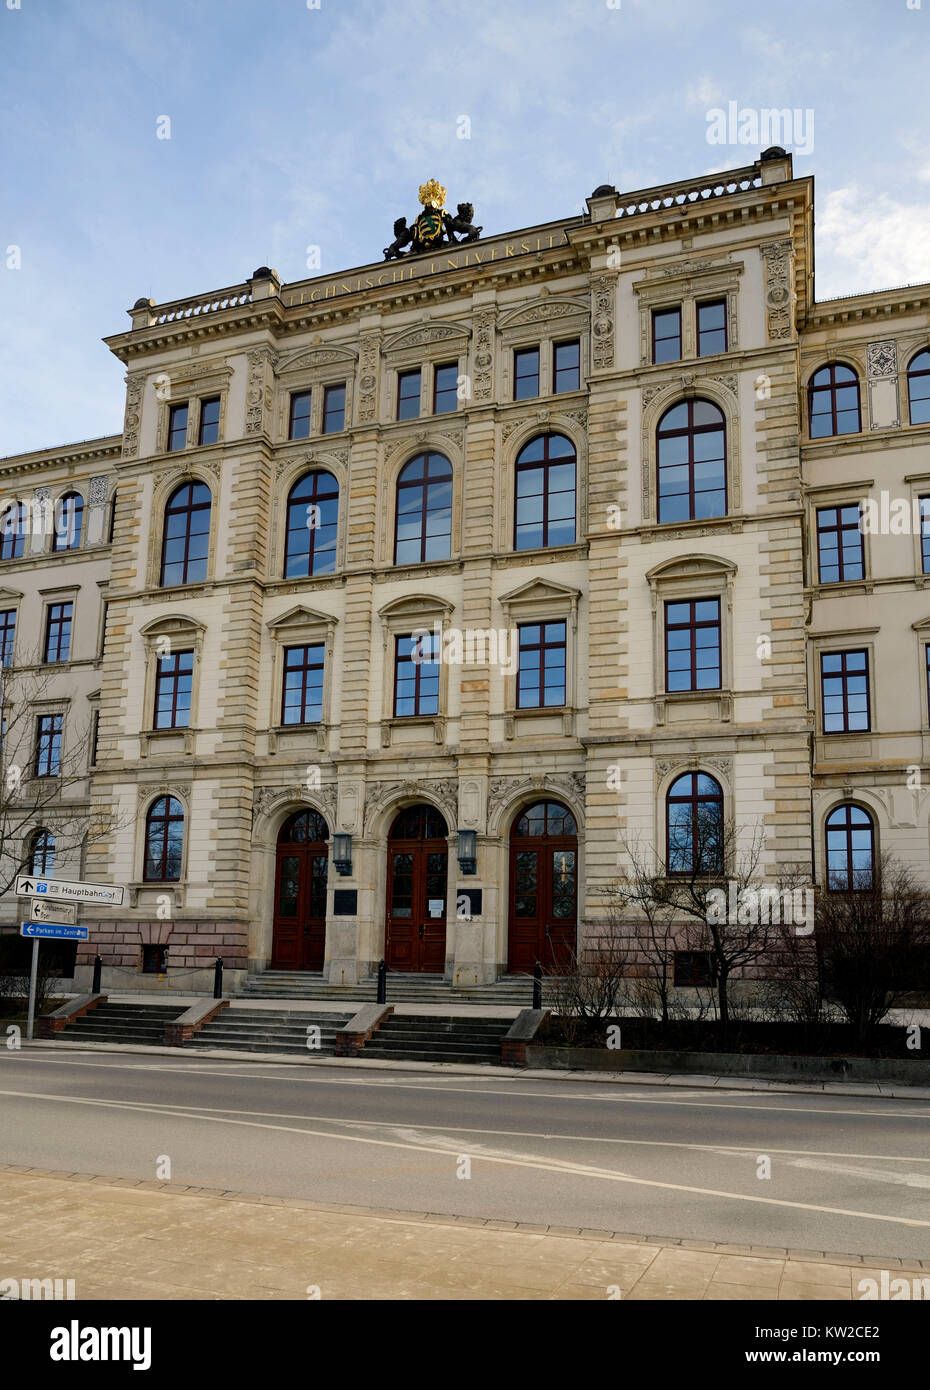 Chemnitz, headmaster's office building of the University of Technology in the street of the nations, Rektoratsgebäude - Stock Image